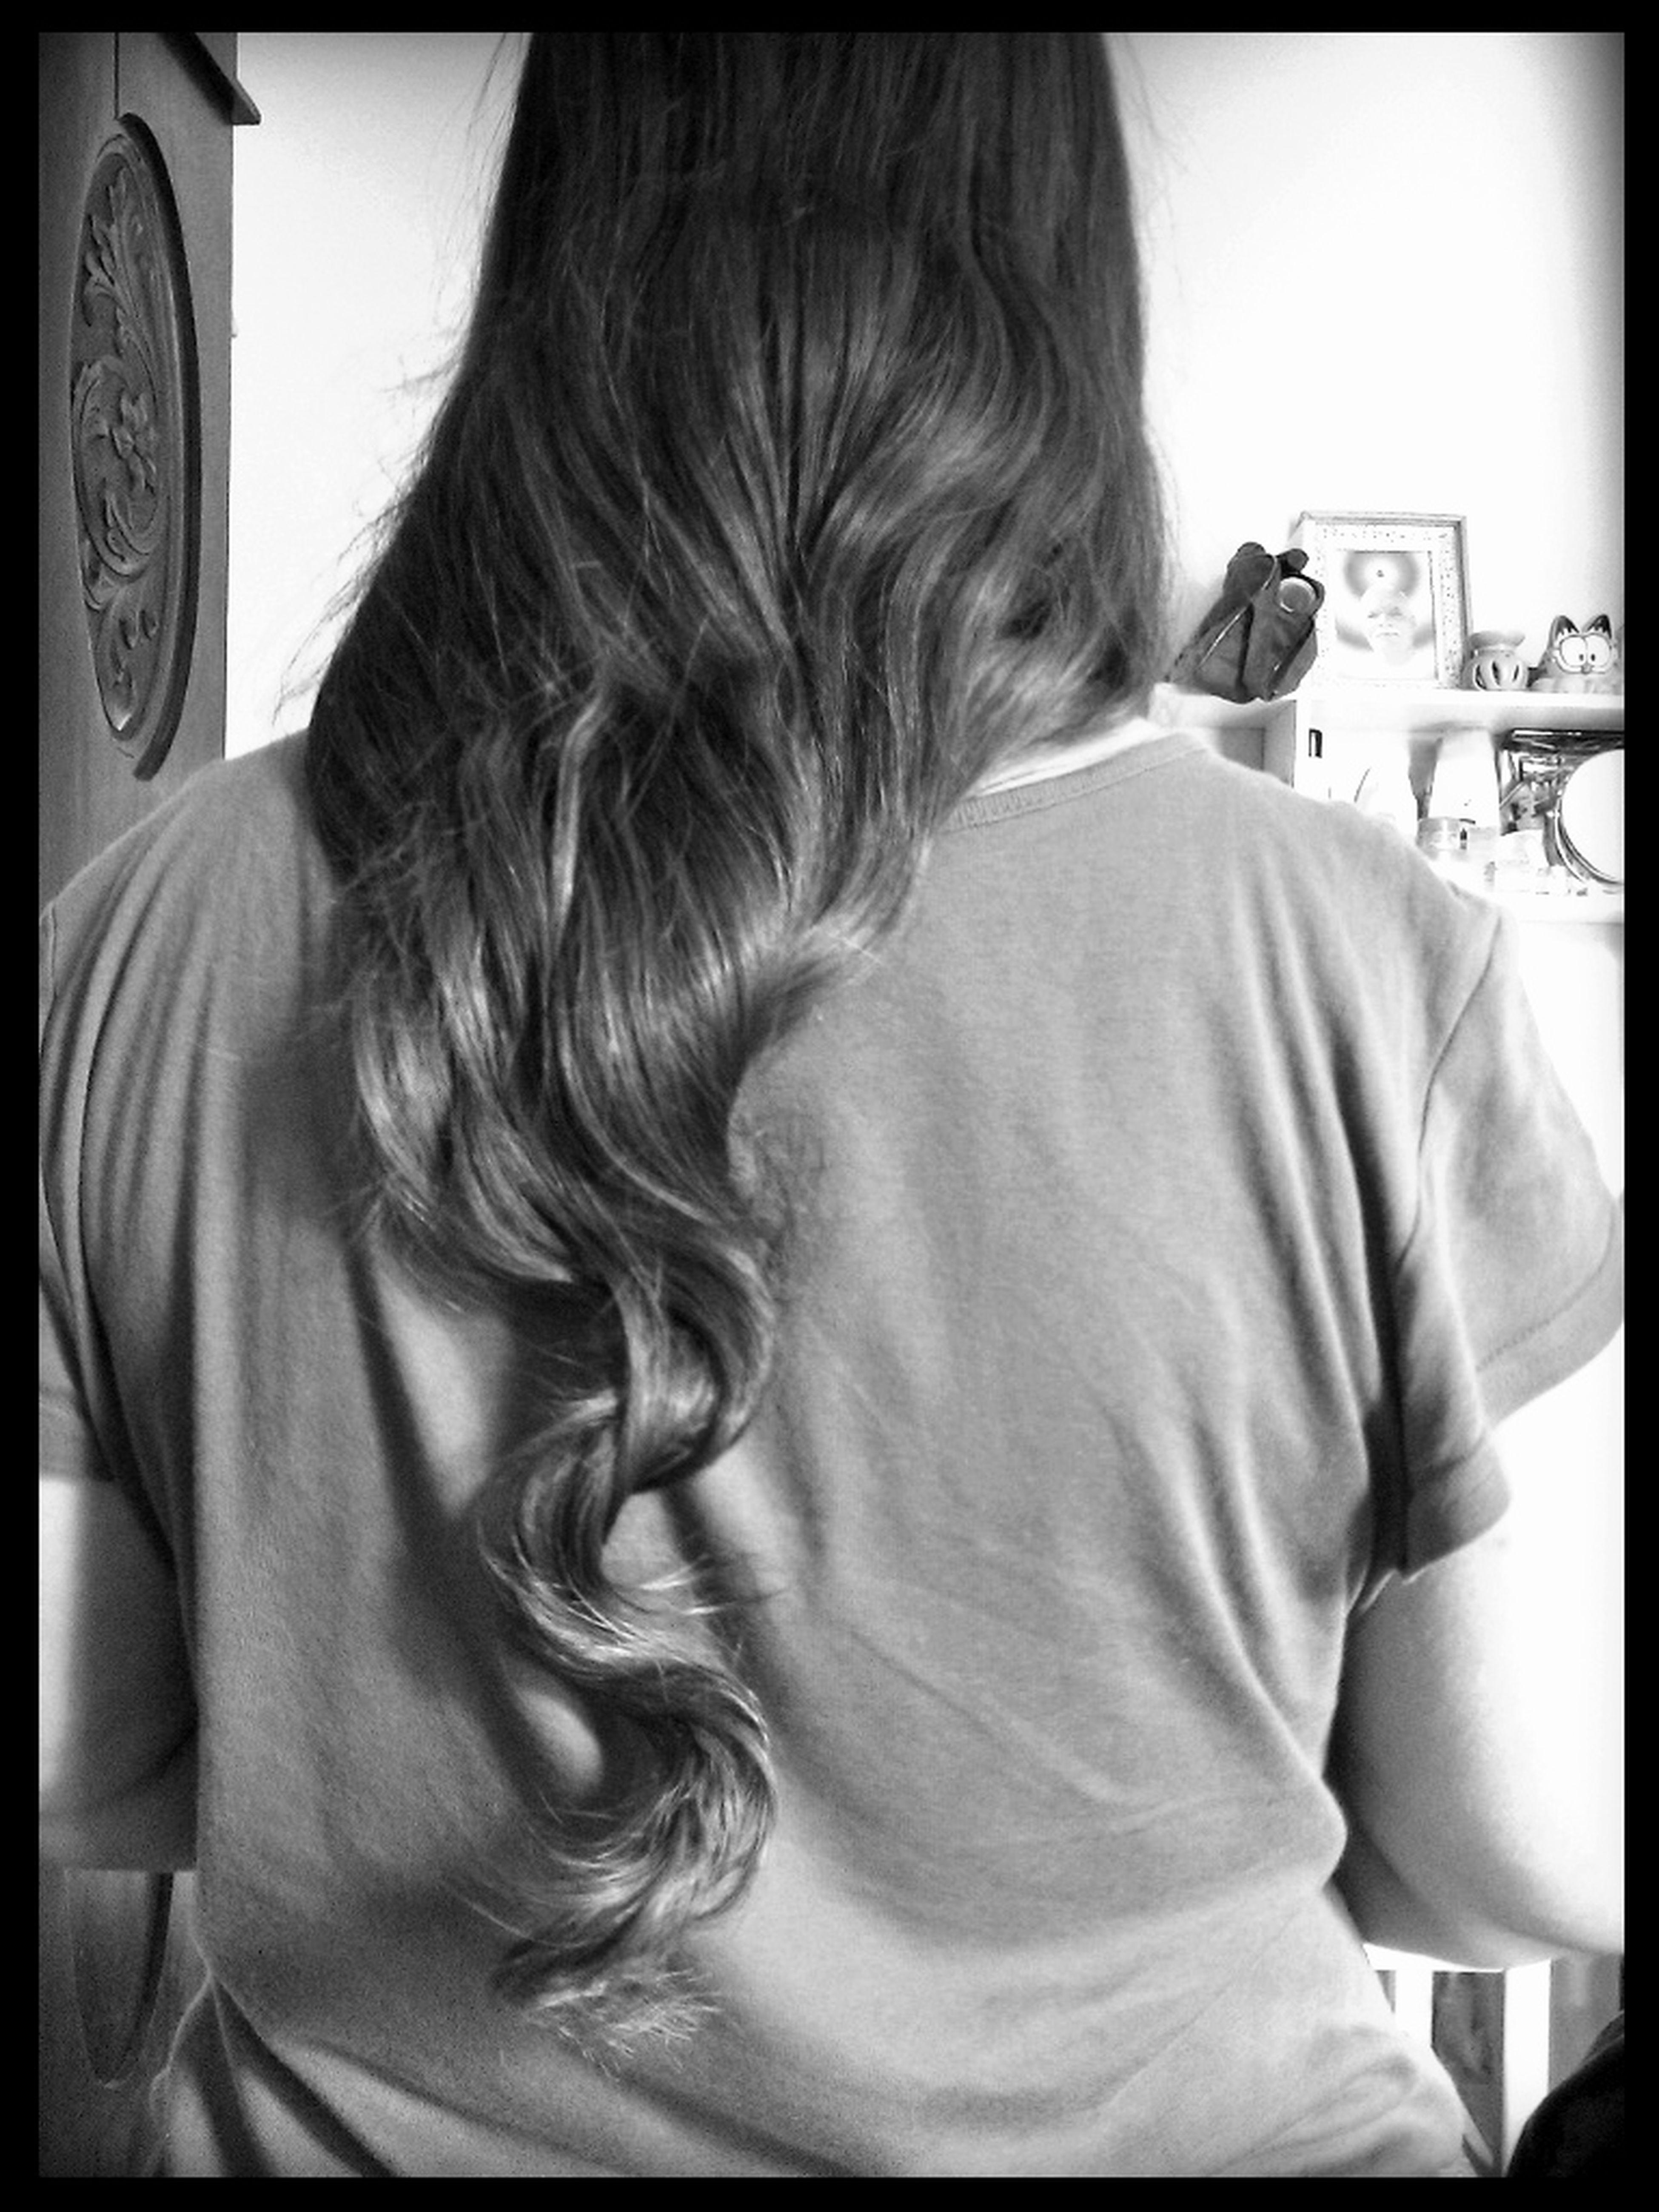 My Hair - LOL